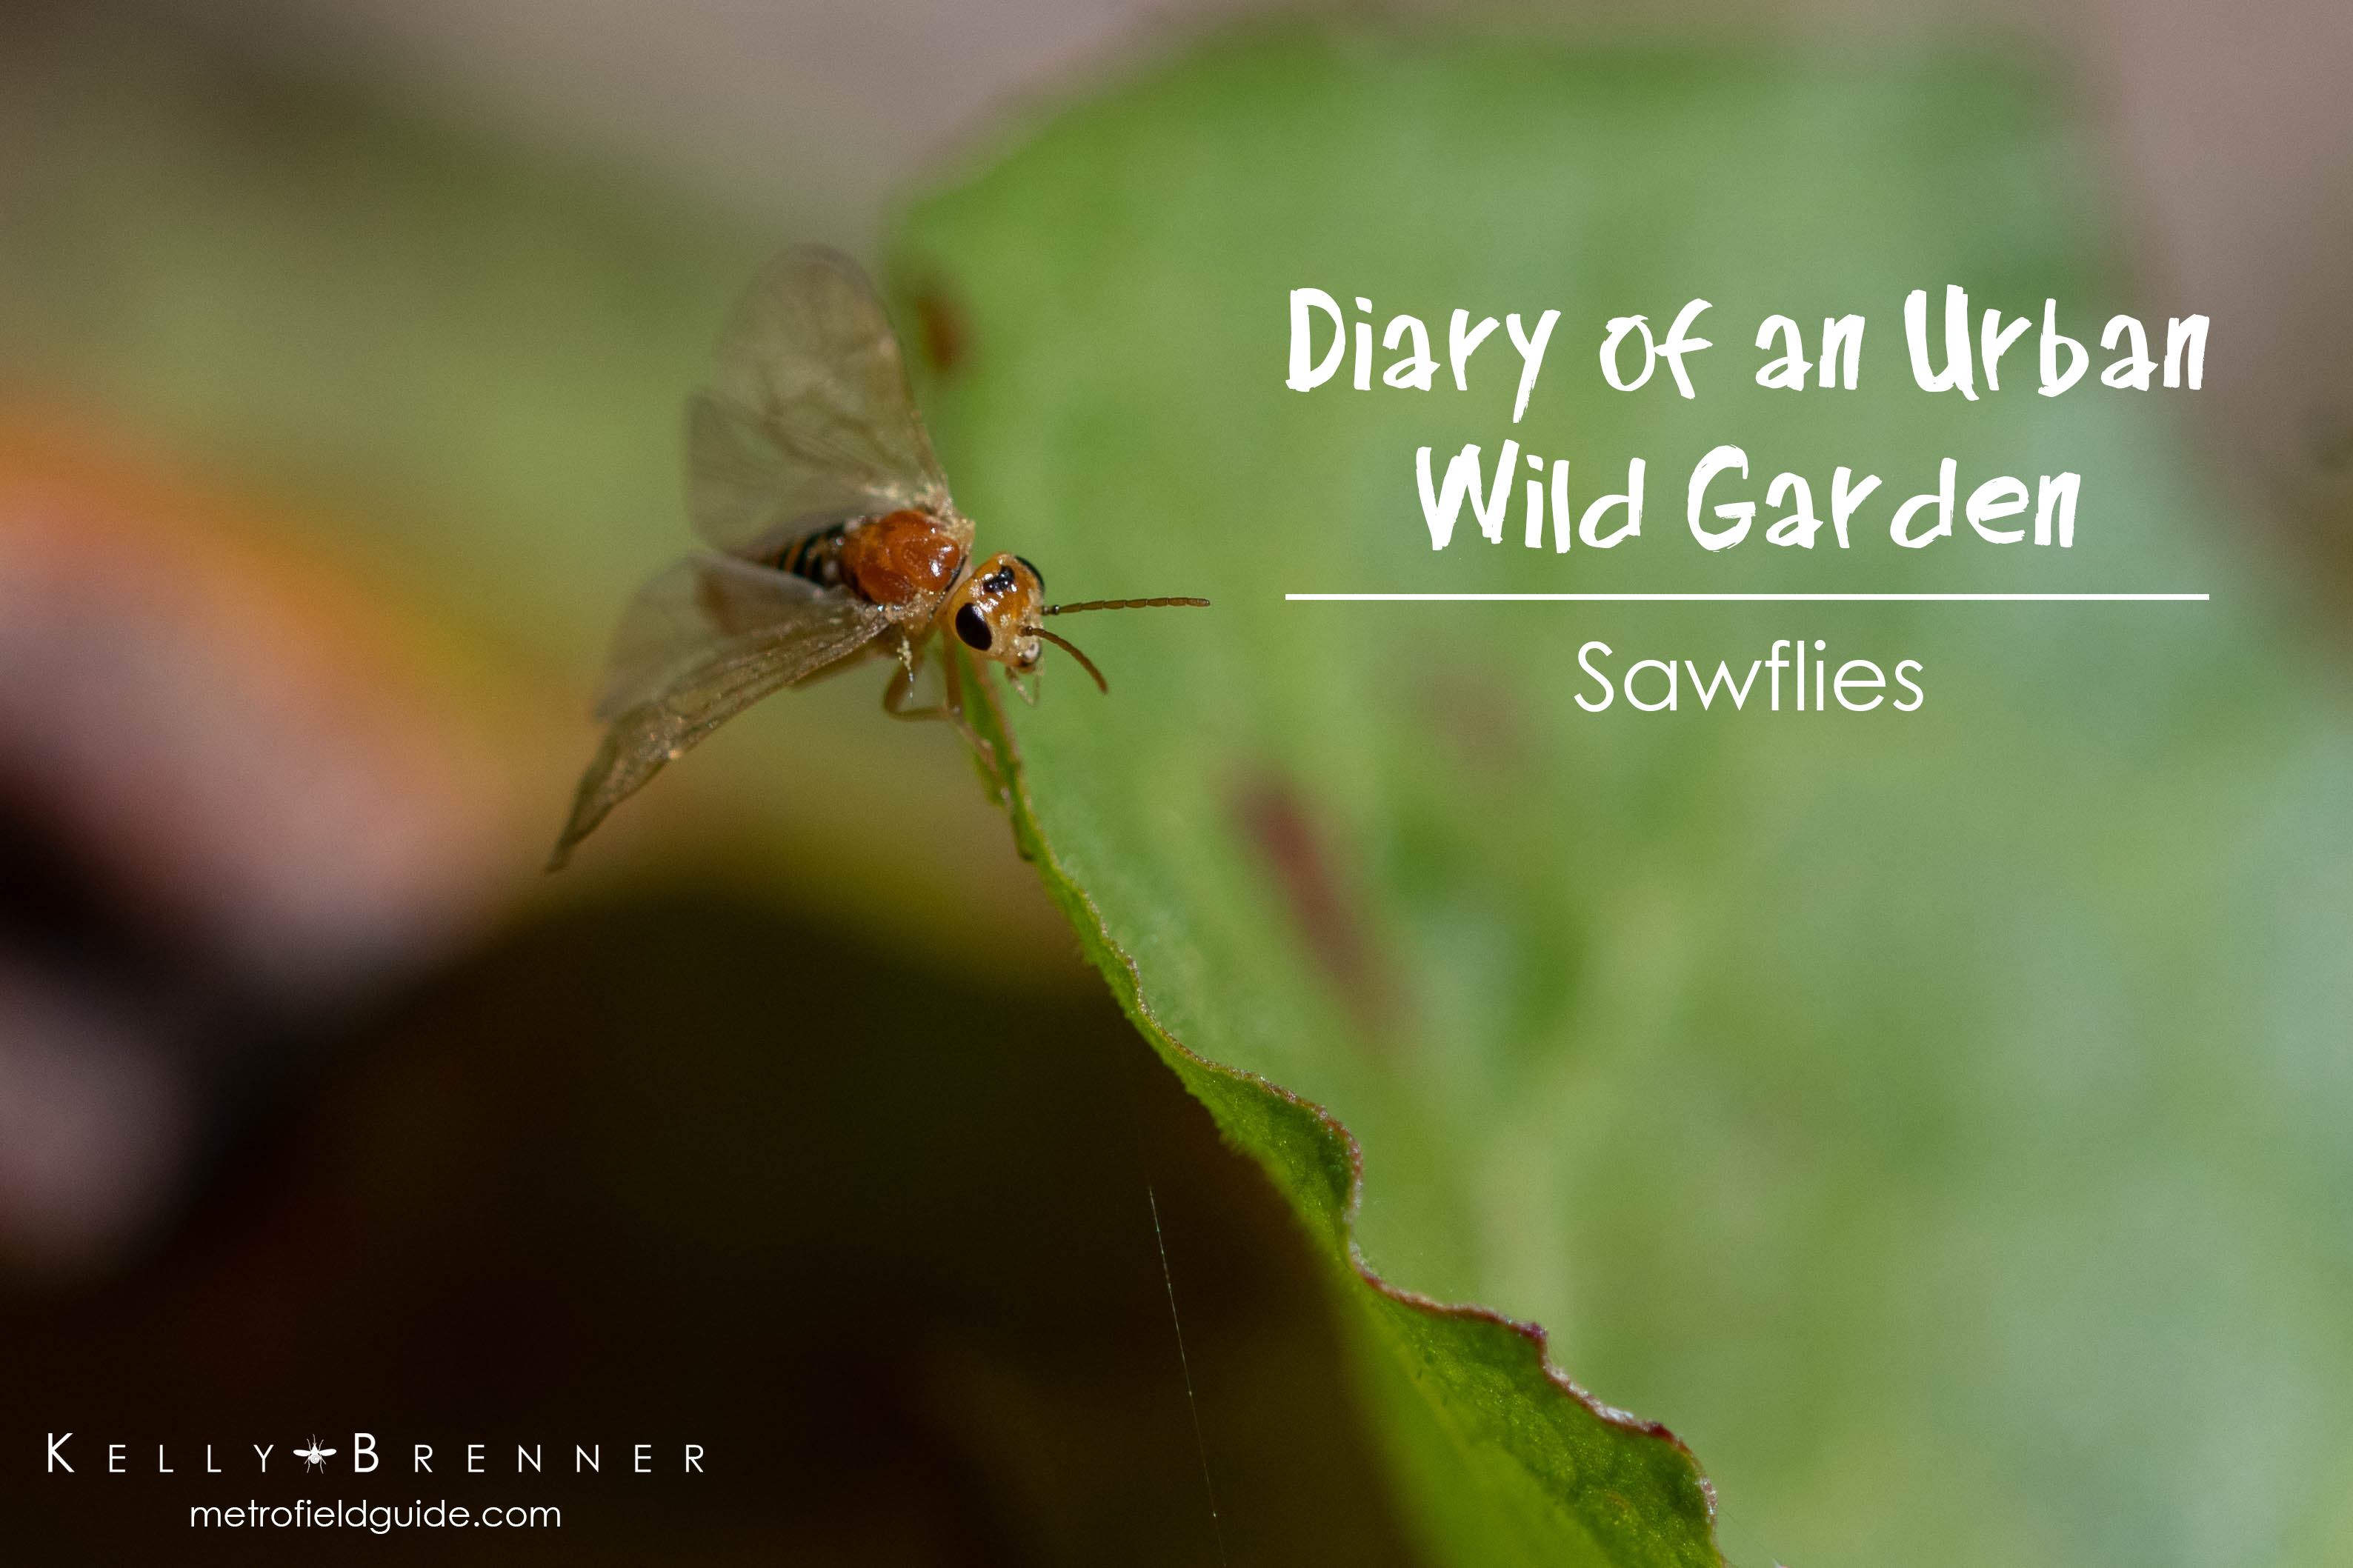 Diary of an Urban Wild Garden: Sawflies